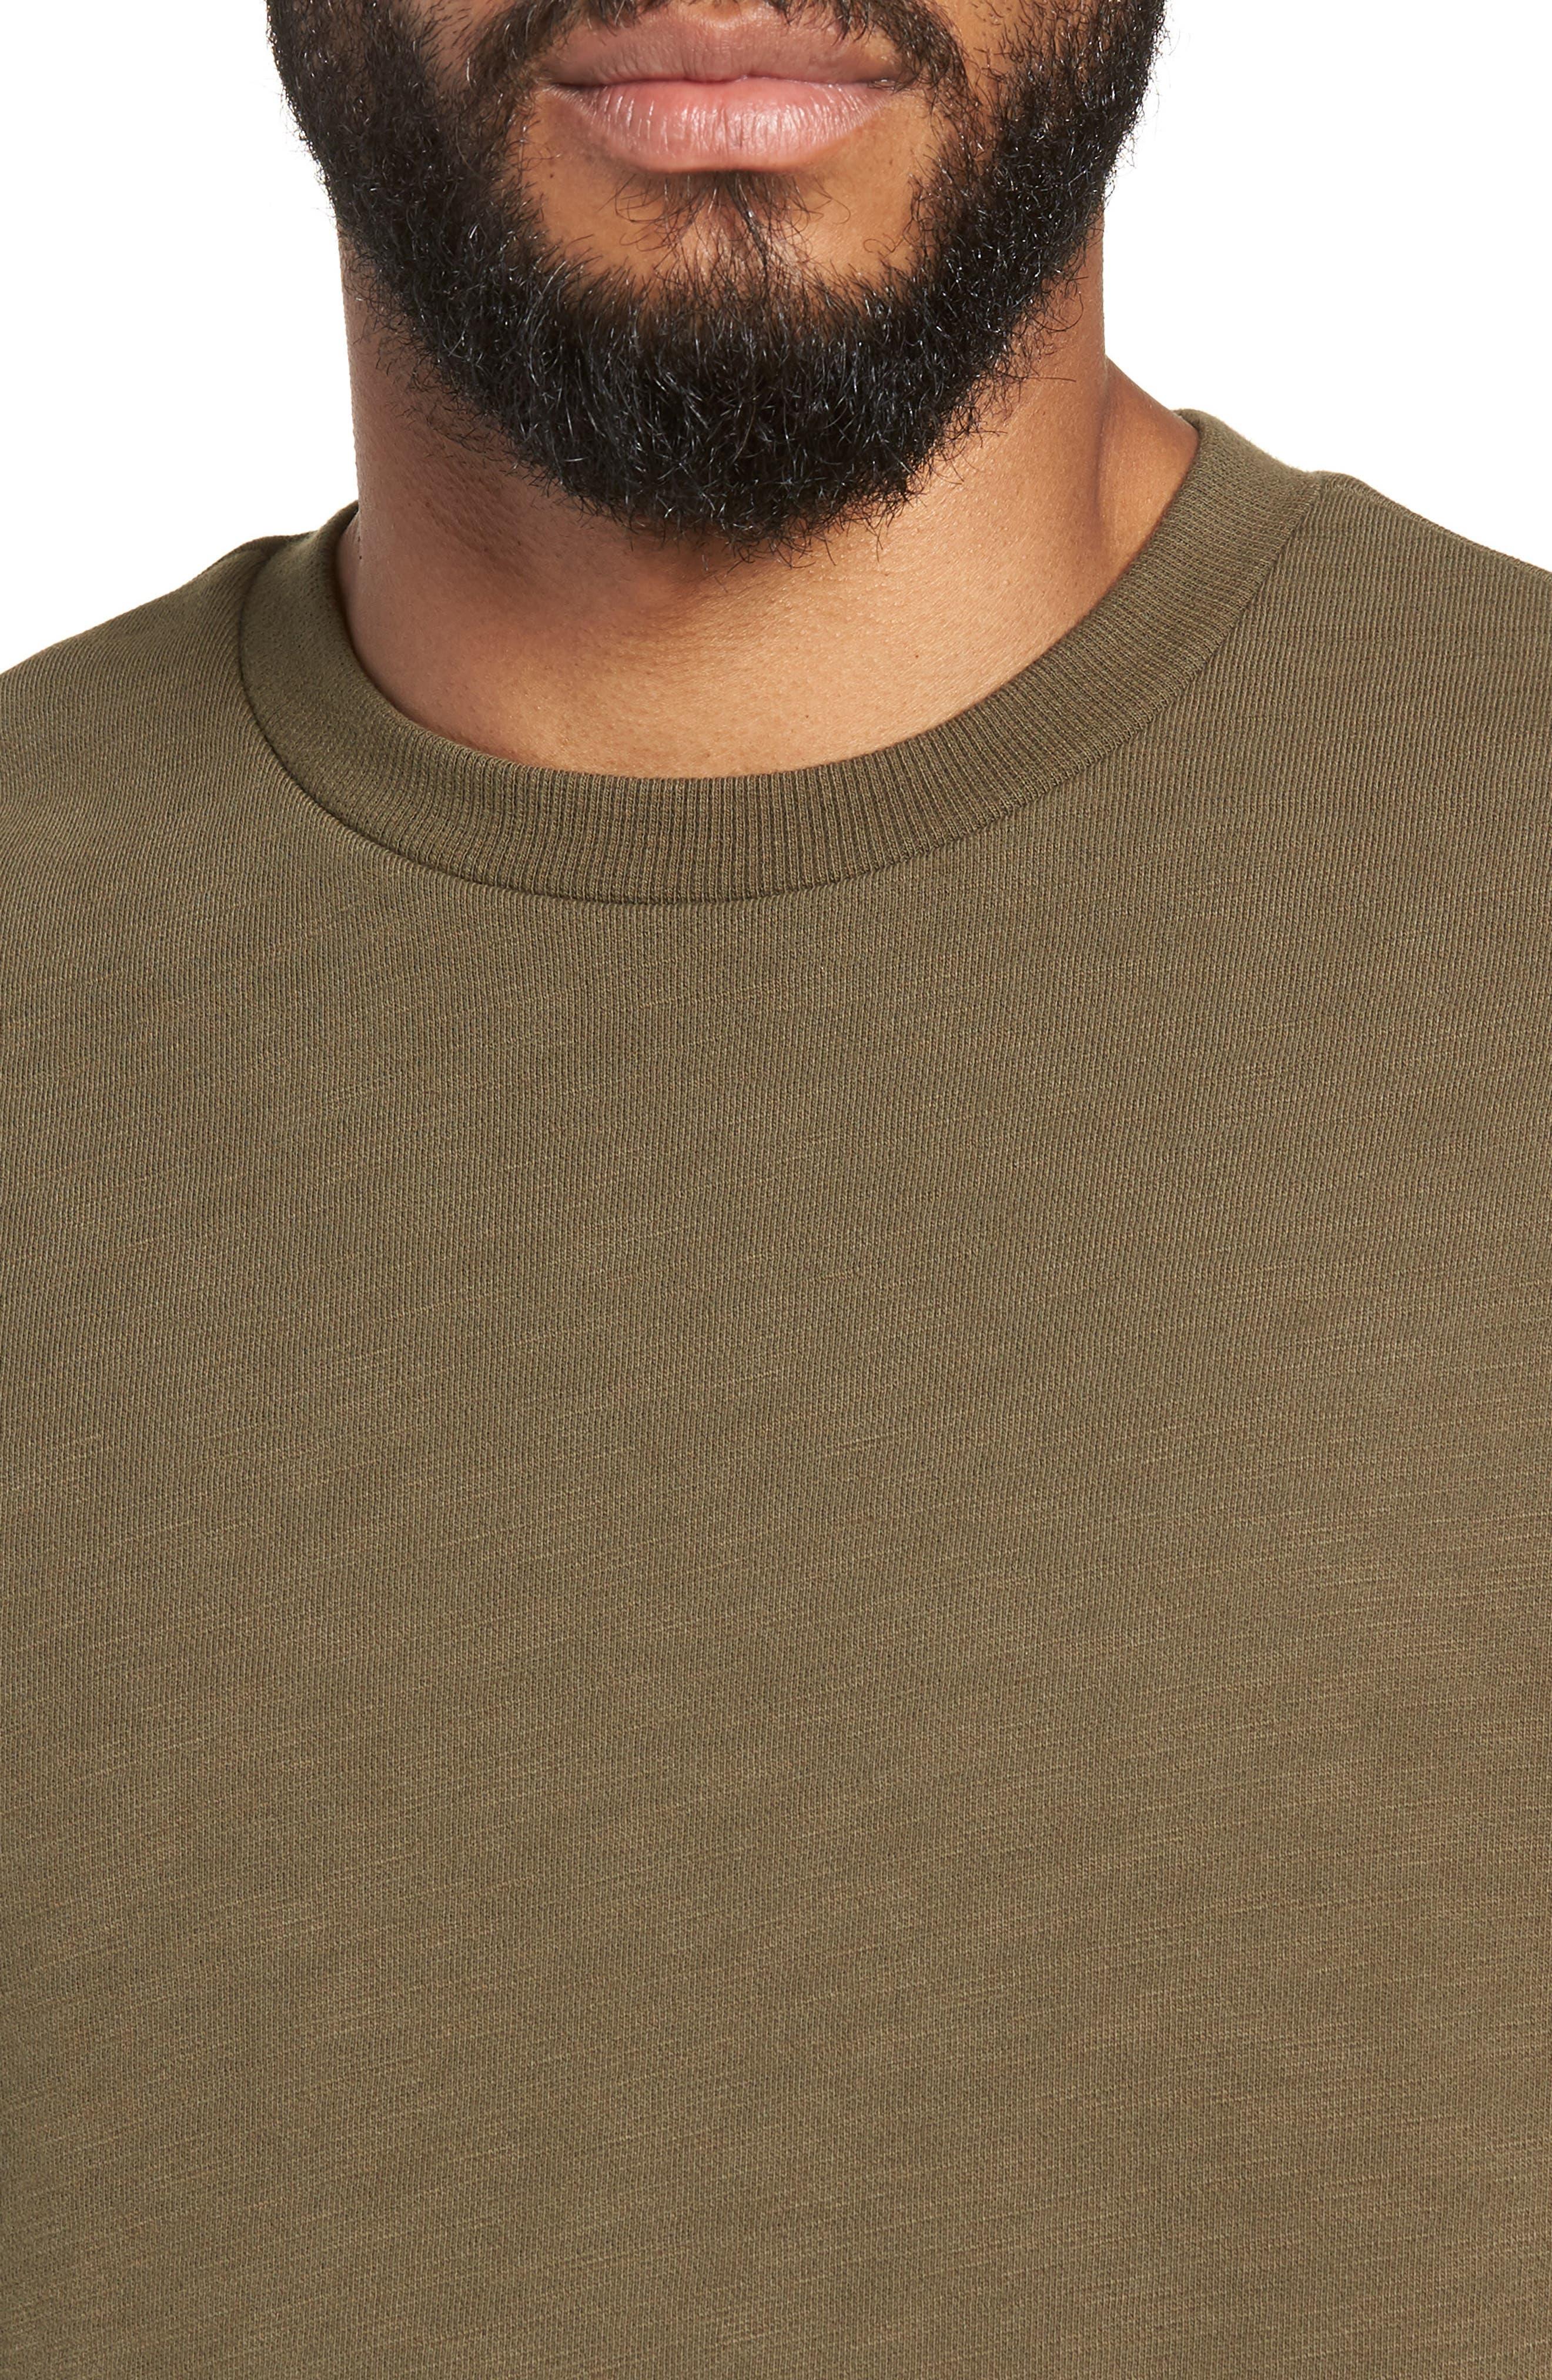 Crewneck Sweatshirt,                             Alternate thumbnail 4, color,                             319